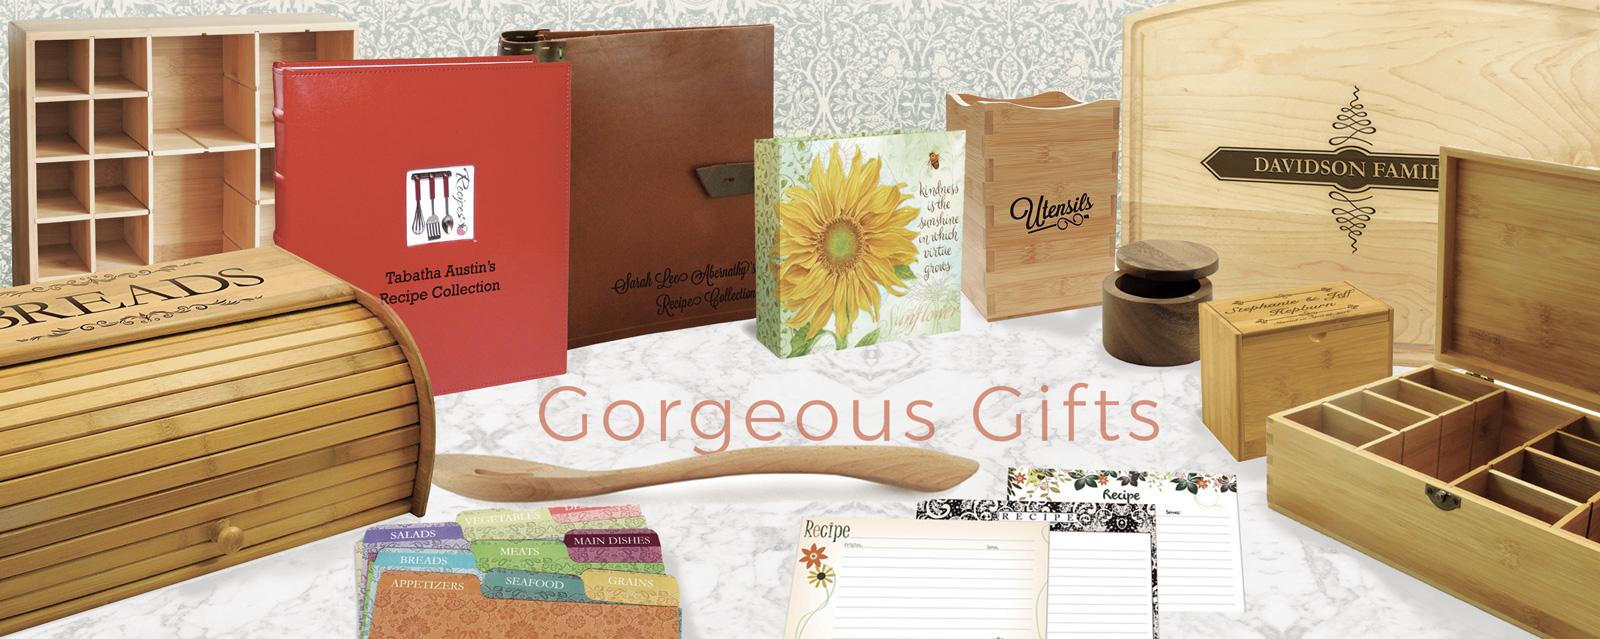 Cookbookpeople Recipe Boxes, Recipe Cards, Tea boxes & More